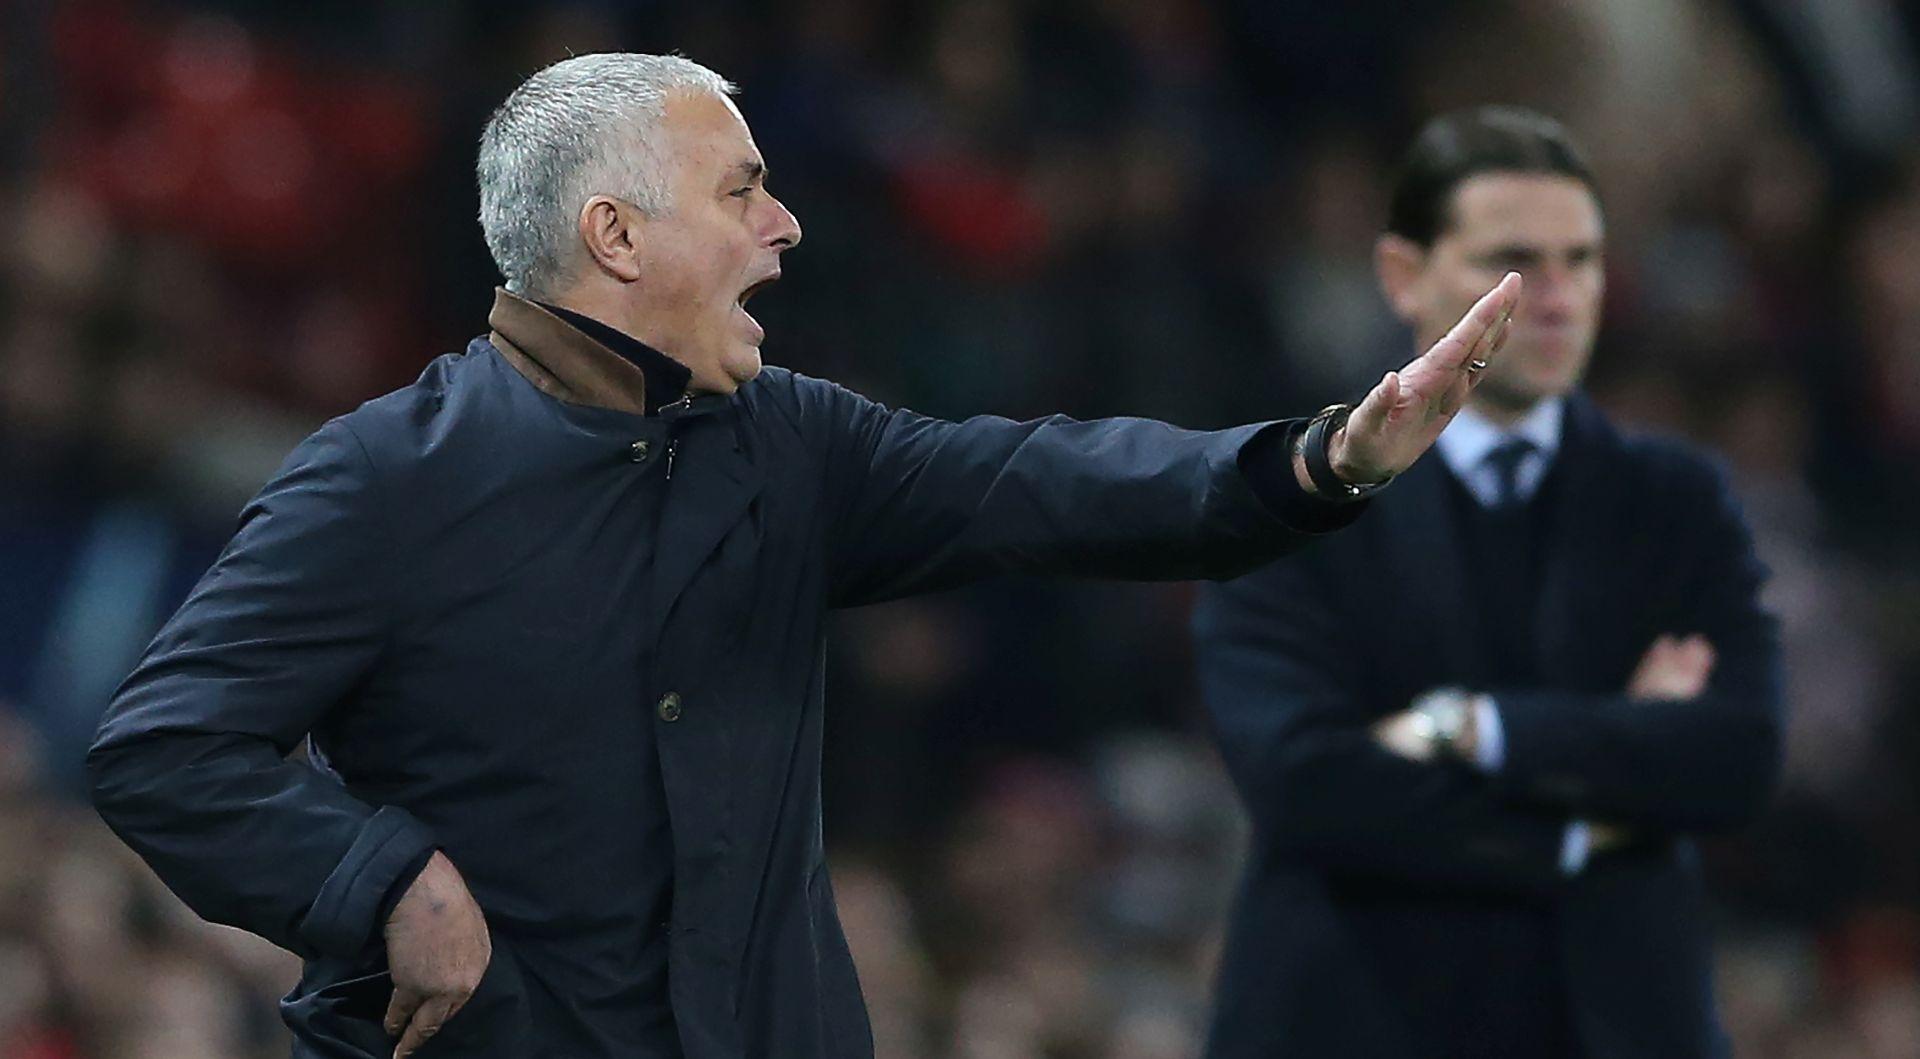 Jose Mourinho dobio otkaz u Manchester Unitedu